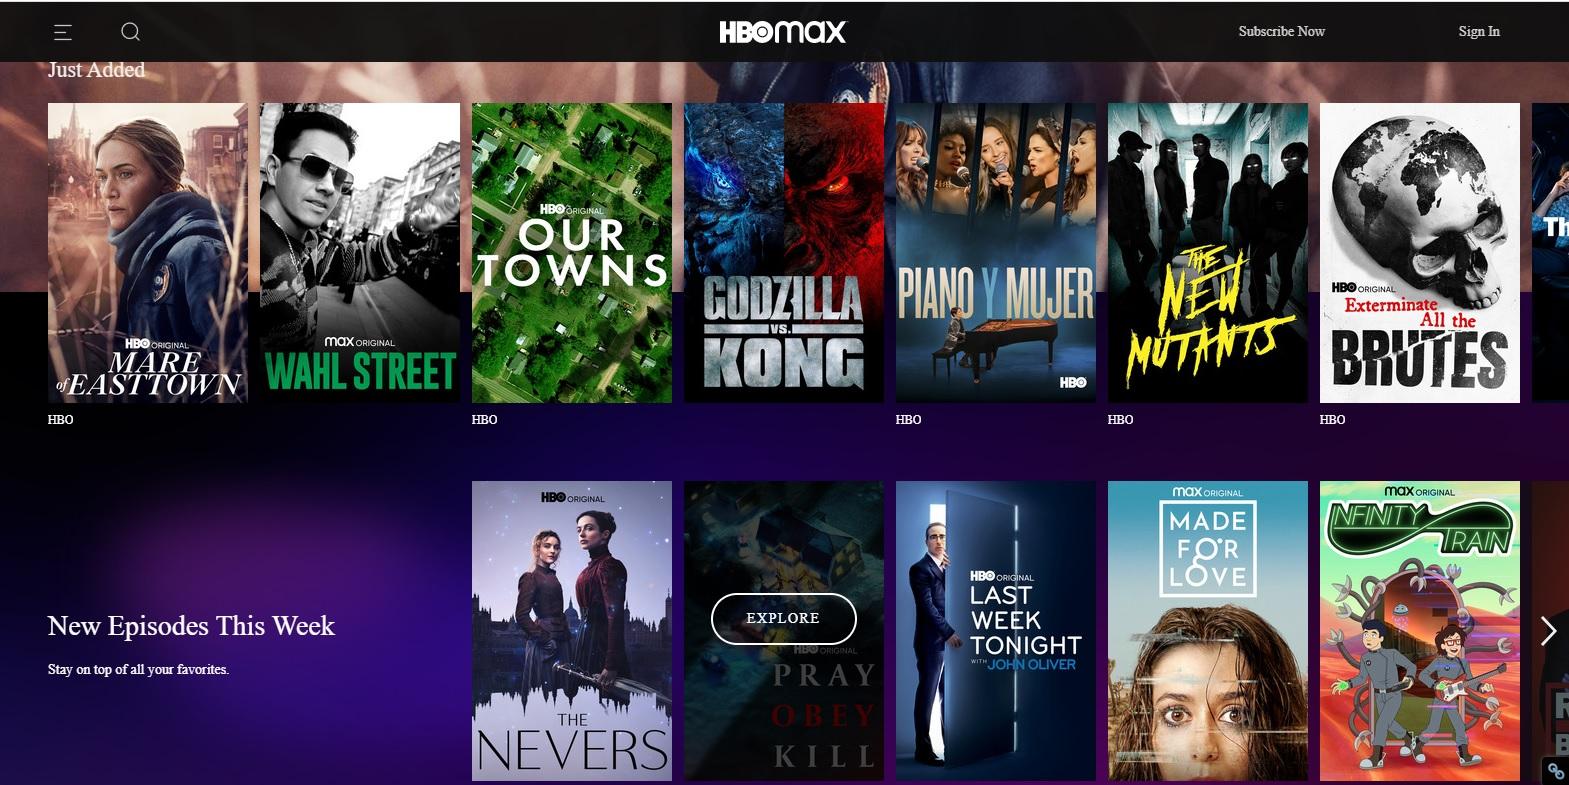 Mortal-Kombat-on-HBO-Max